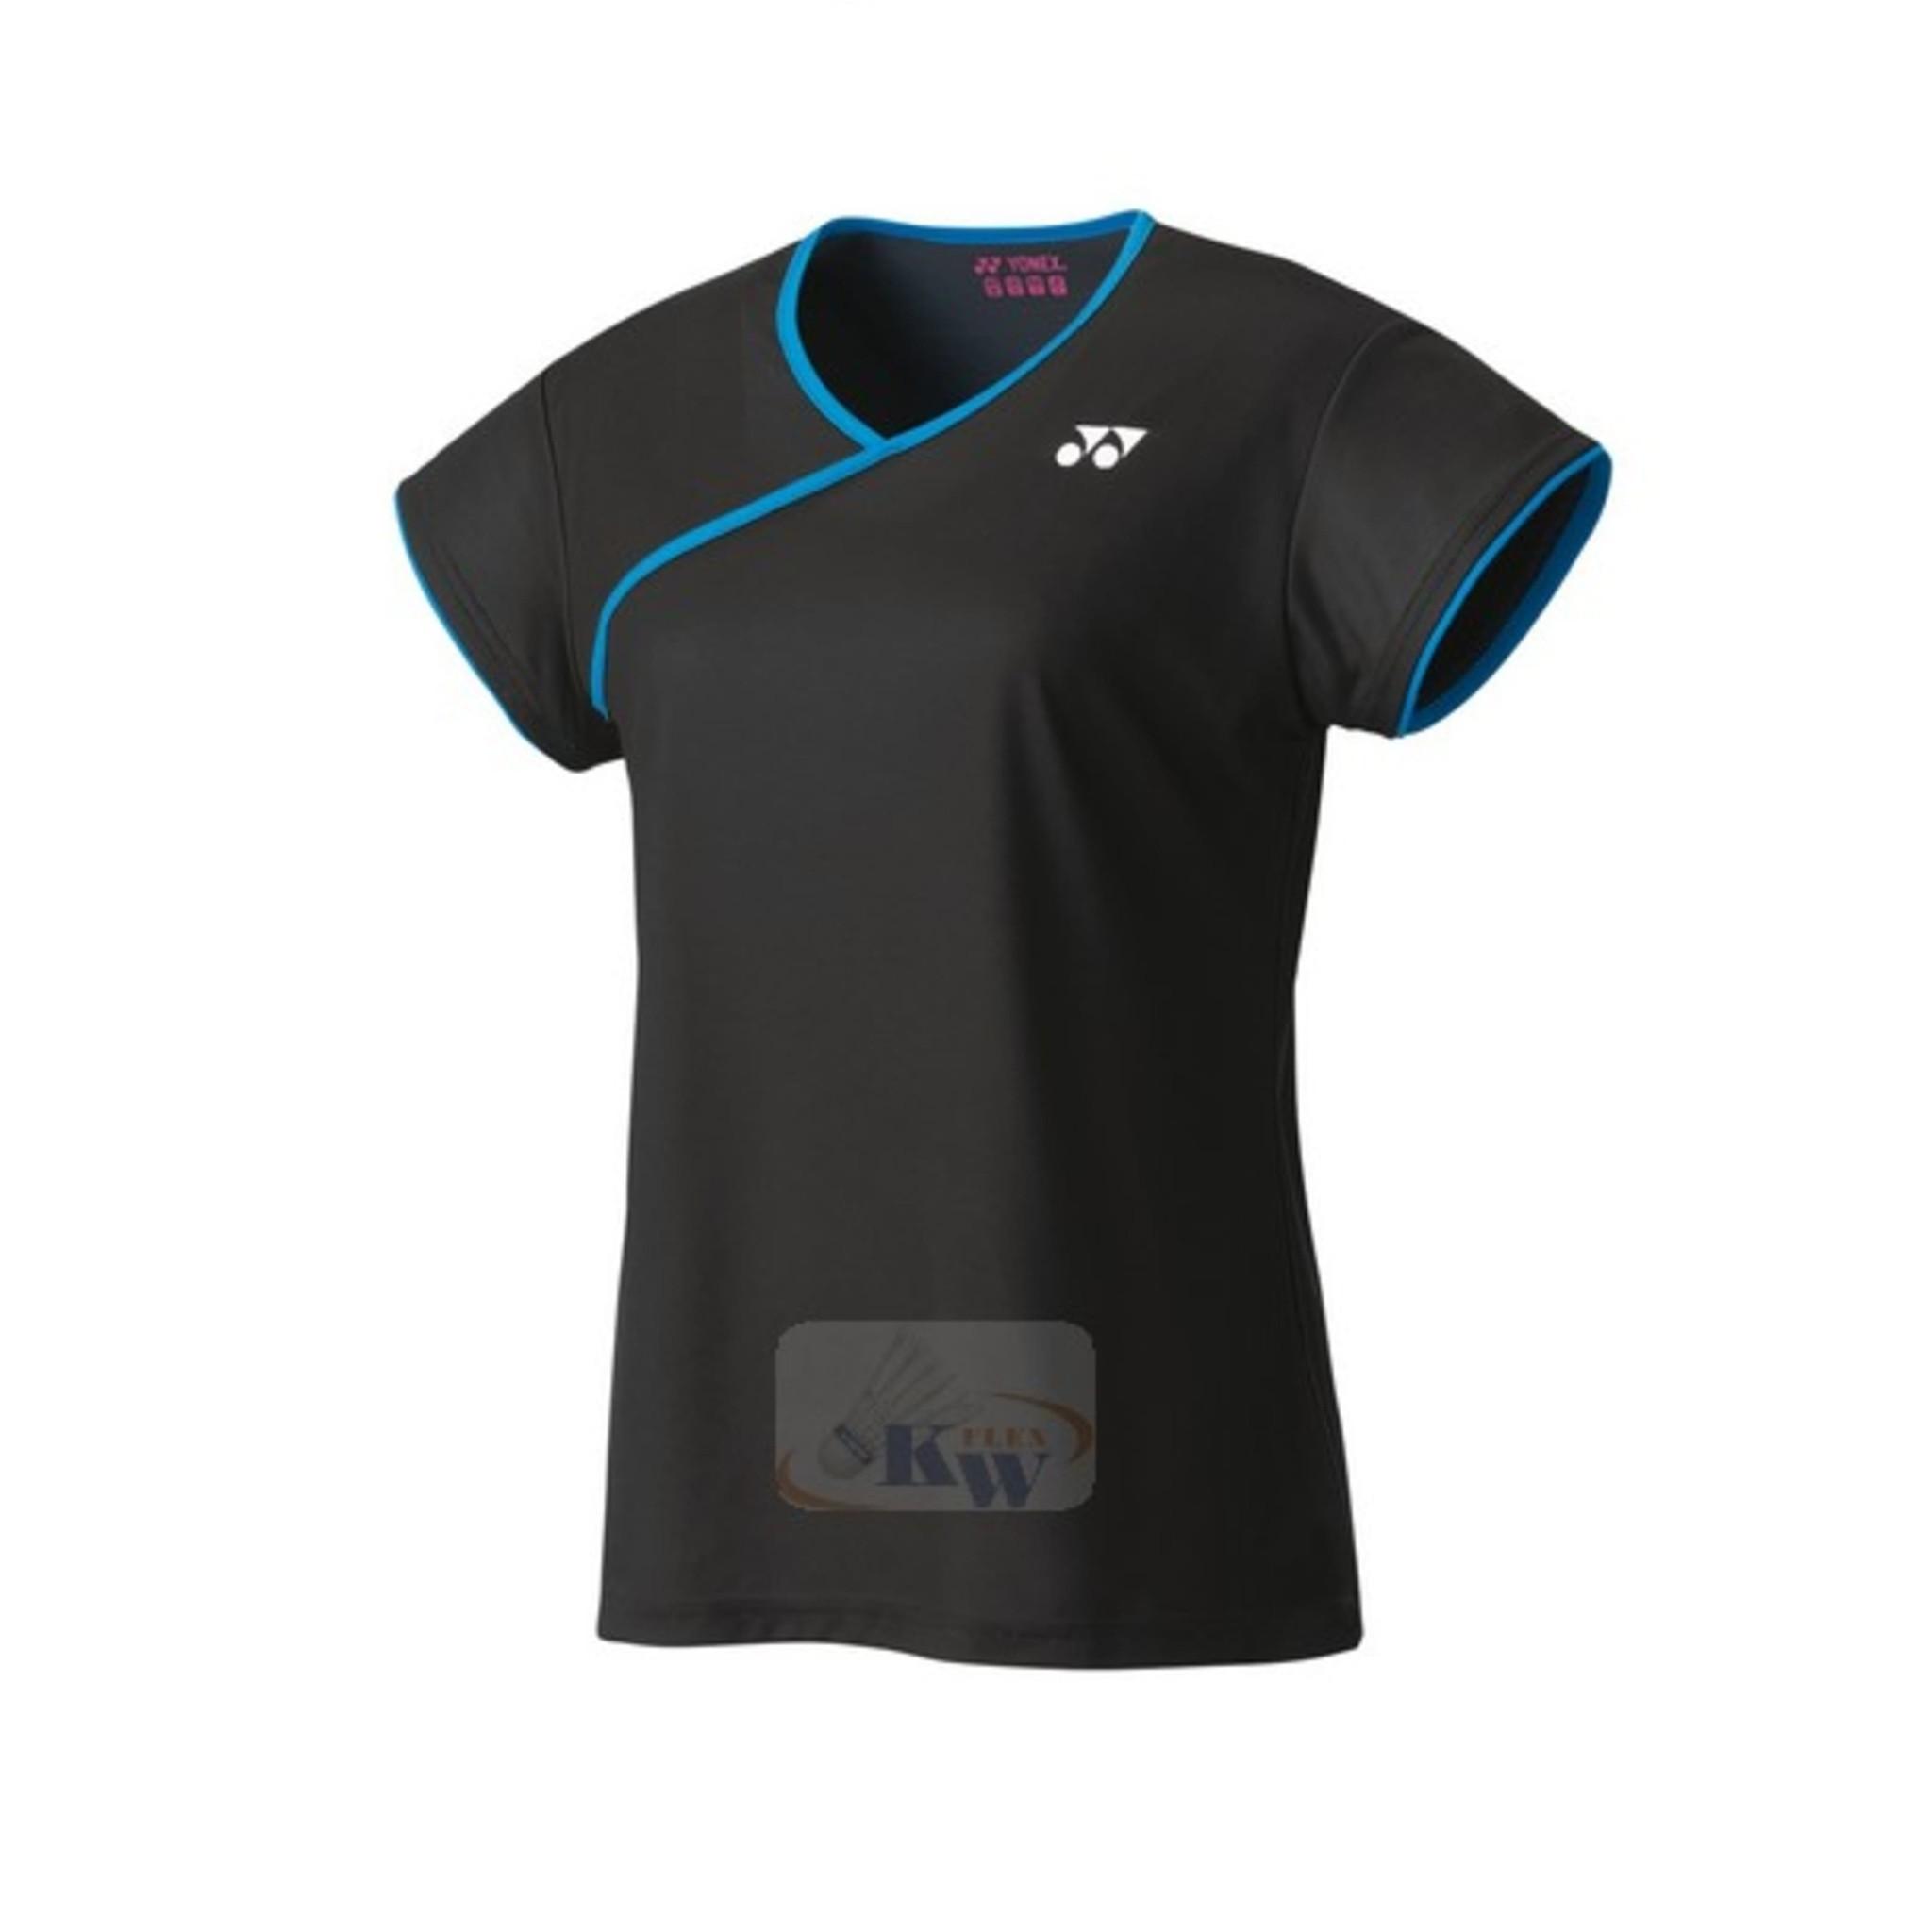 yonex 16444ex schwarz damen t-shirt kaufen?